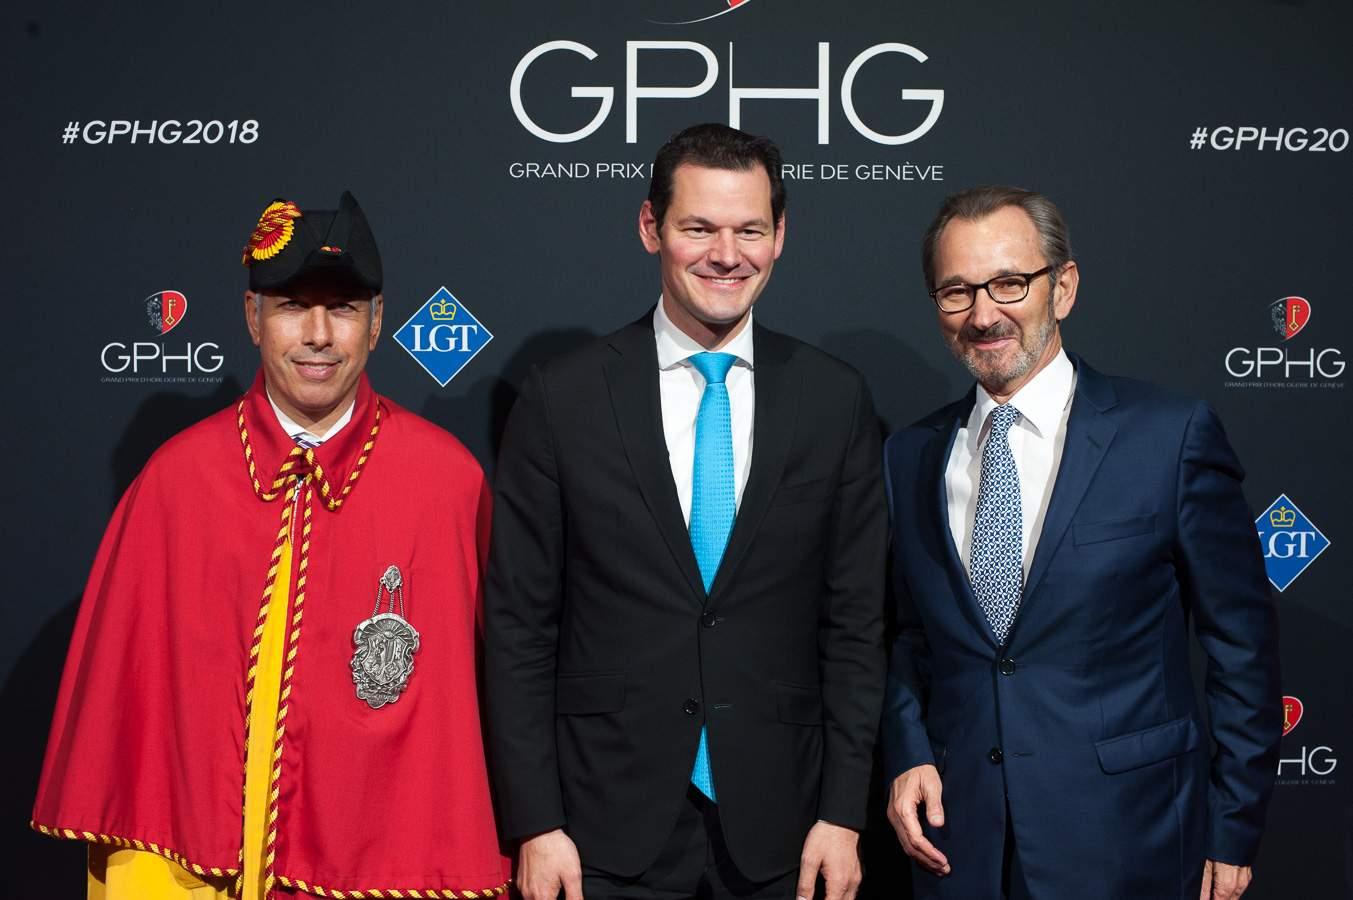 Pierre Maudet, Geneva State Concillor and Raymond Loretan, president of the GPHG Foundation